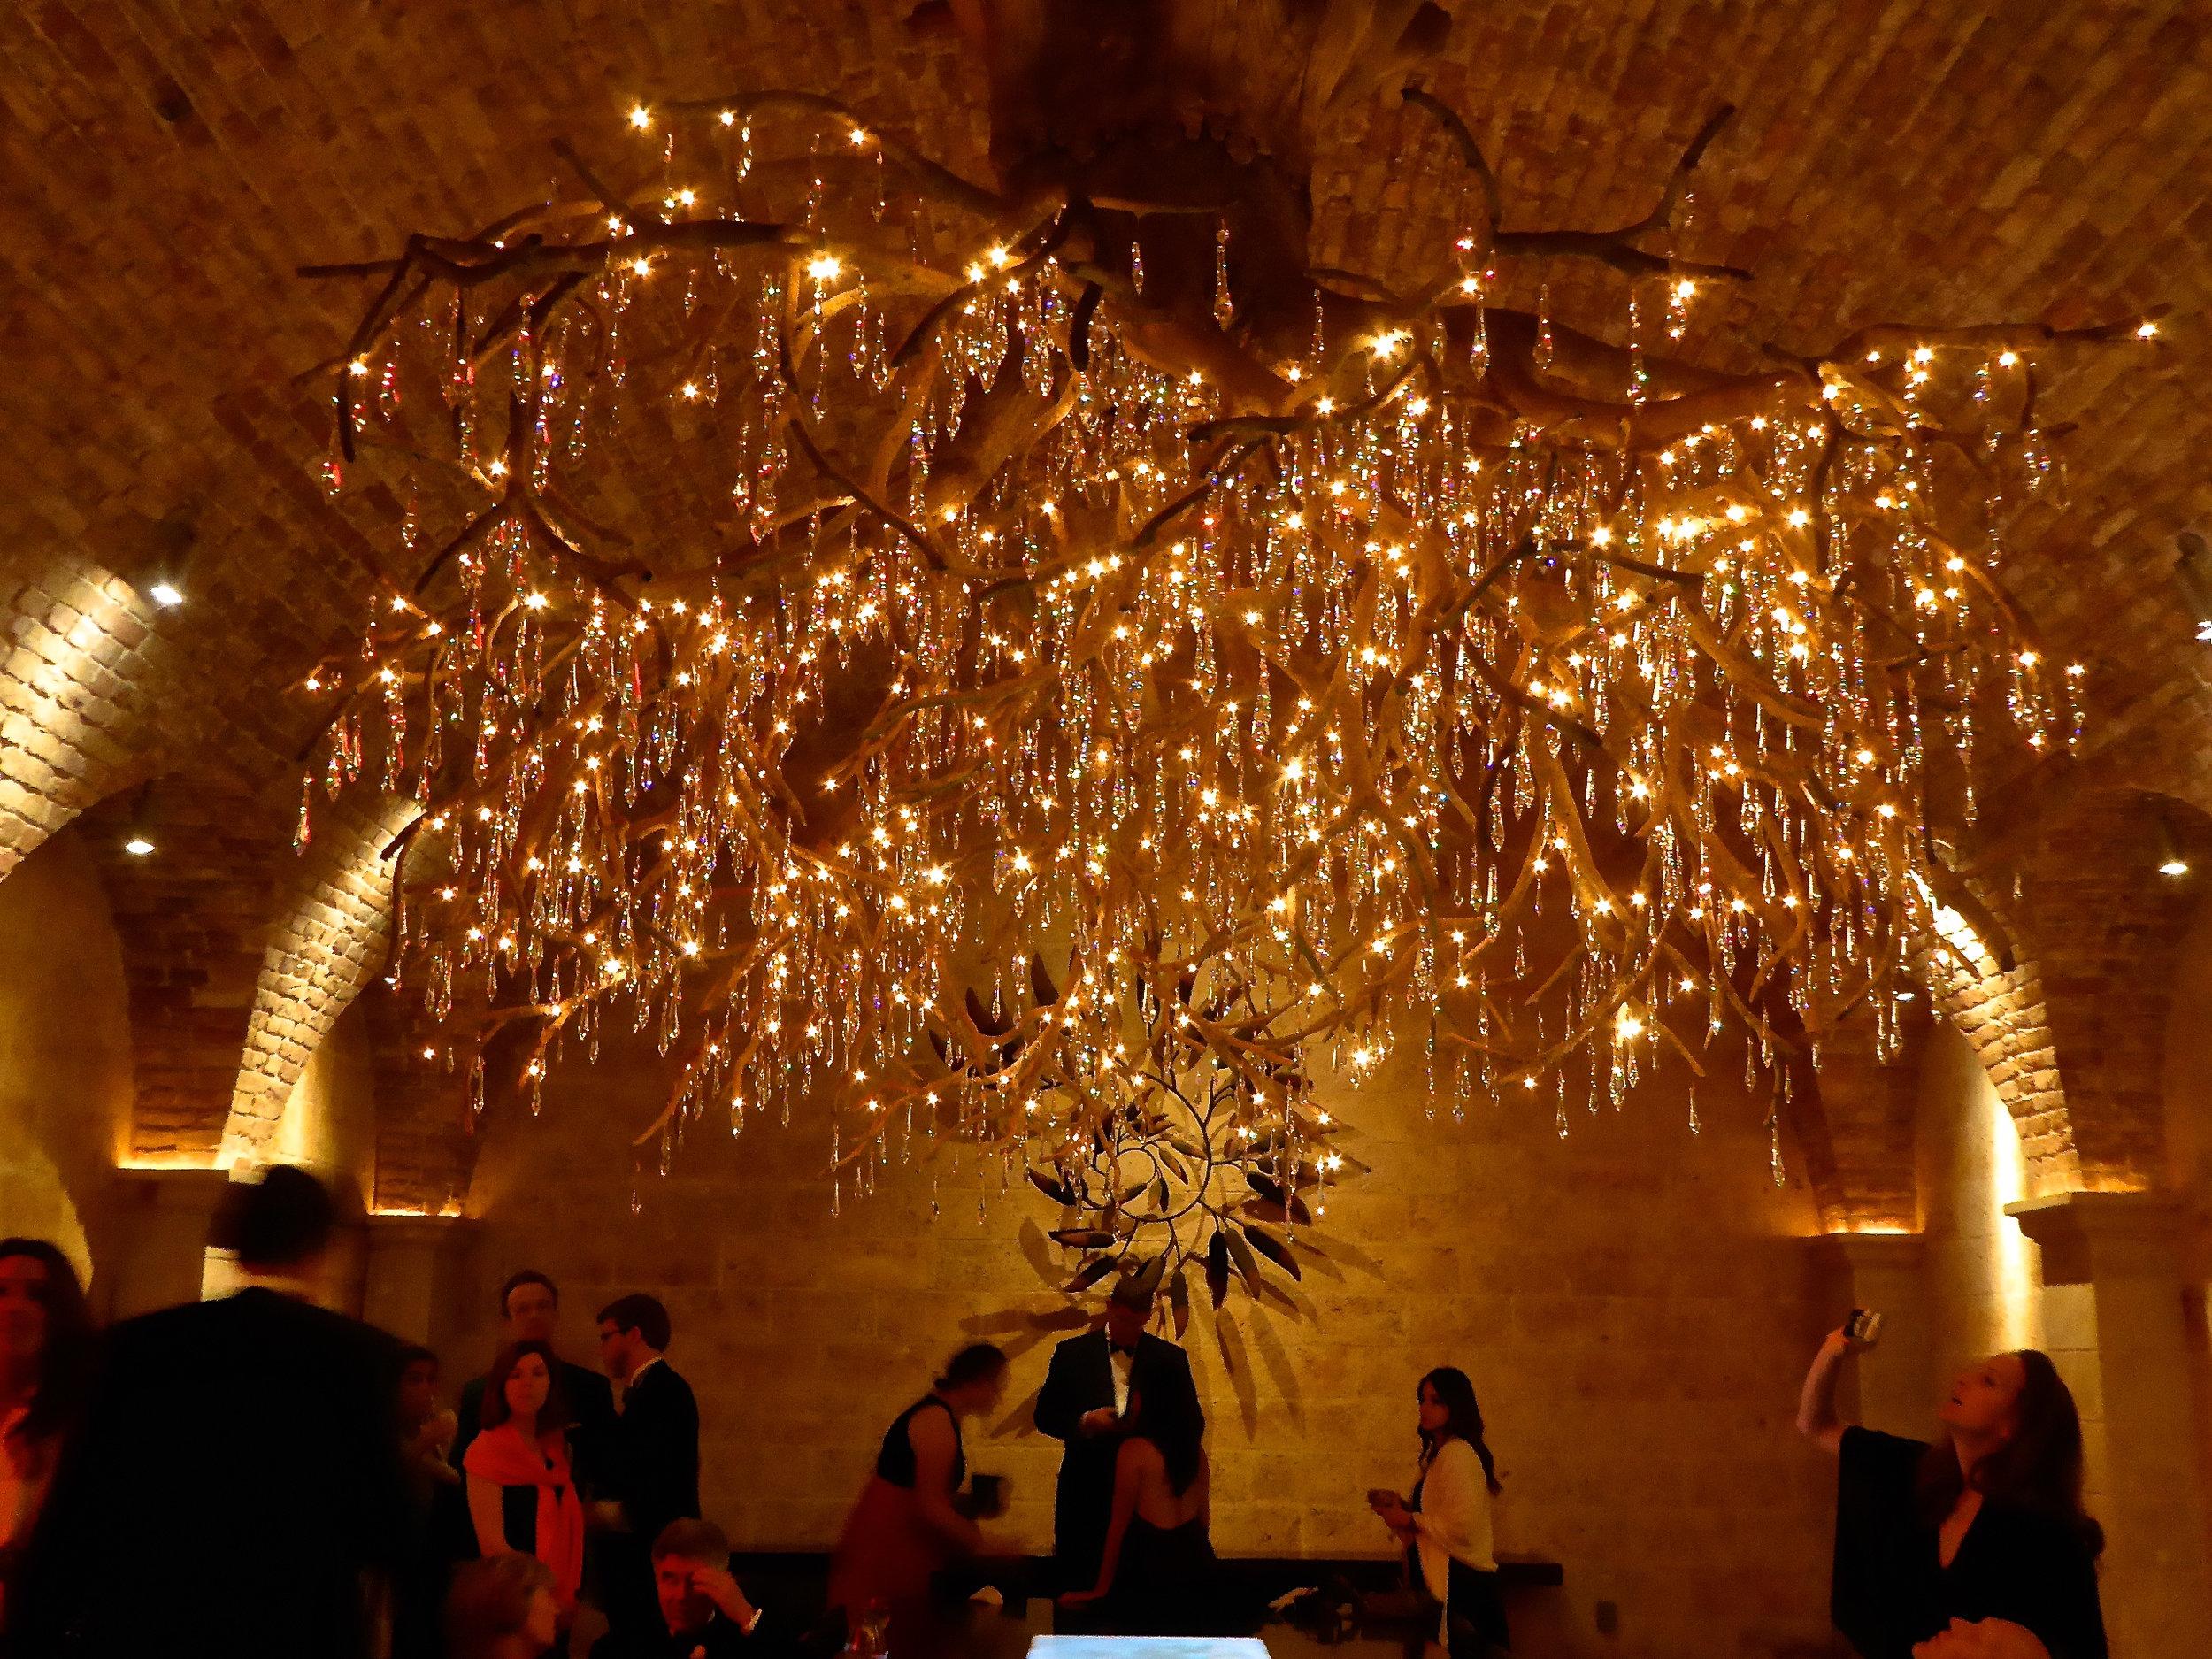 cindi_Hall_wines_chandelier_spiritedtable_photot1.jpg